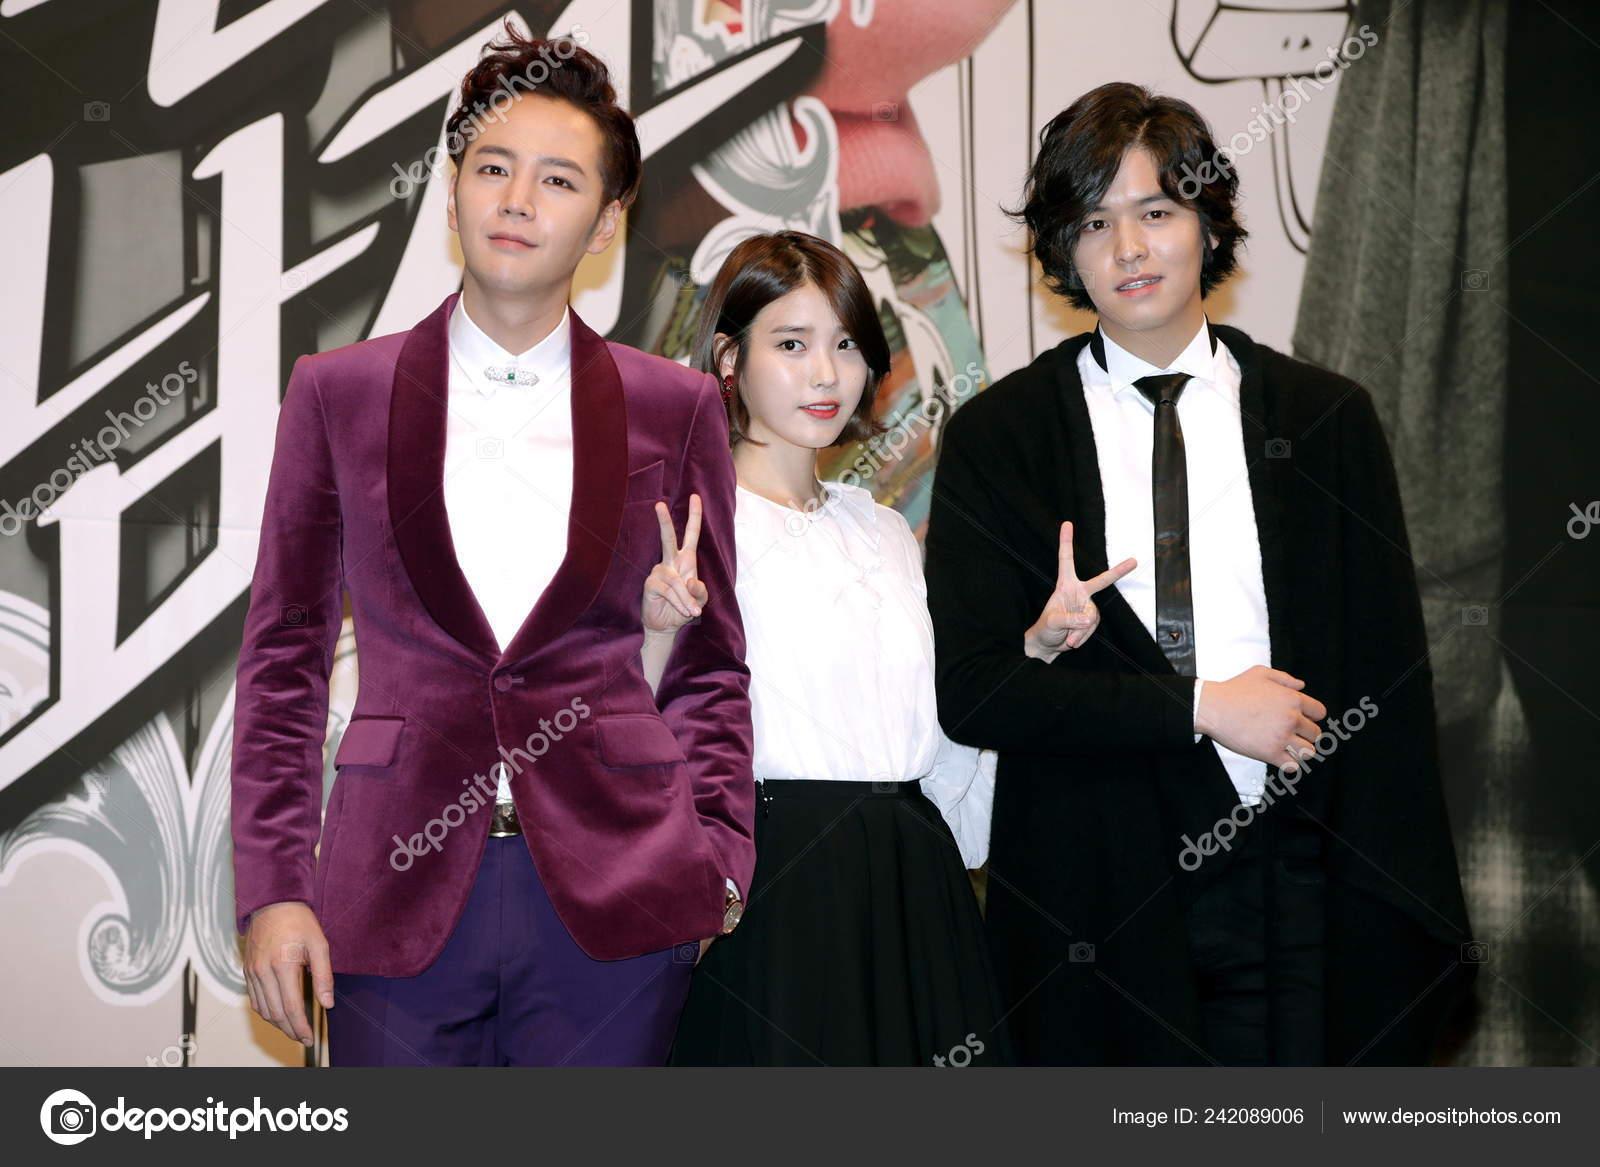 Jang Geun Suk og IU datingbeste online dating verden over